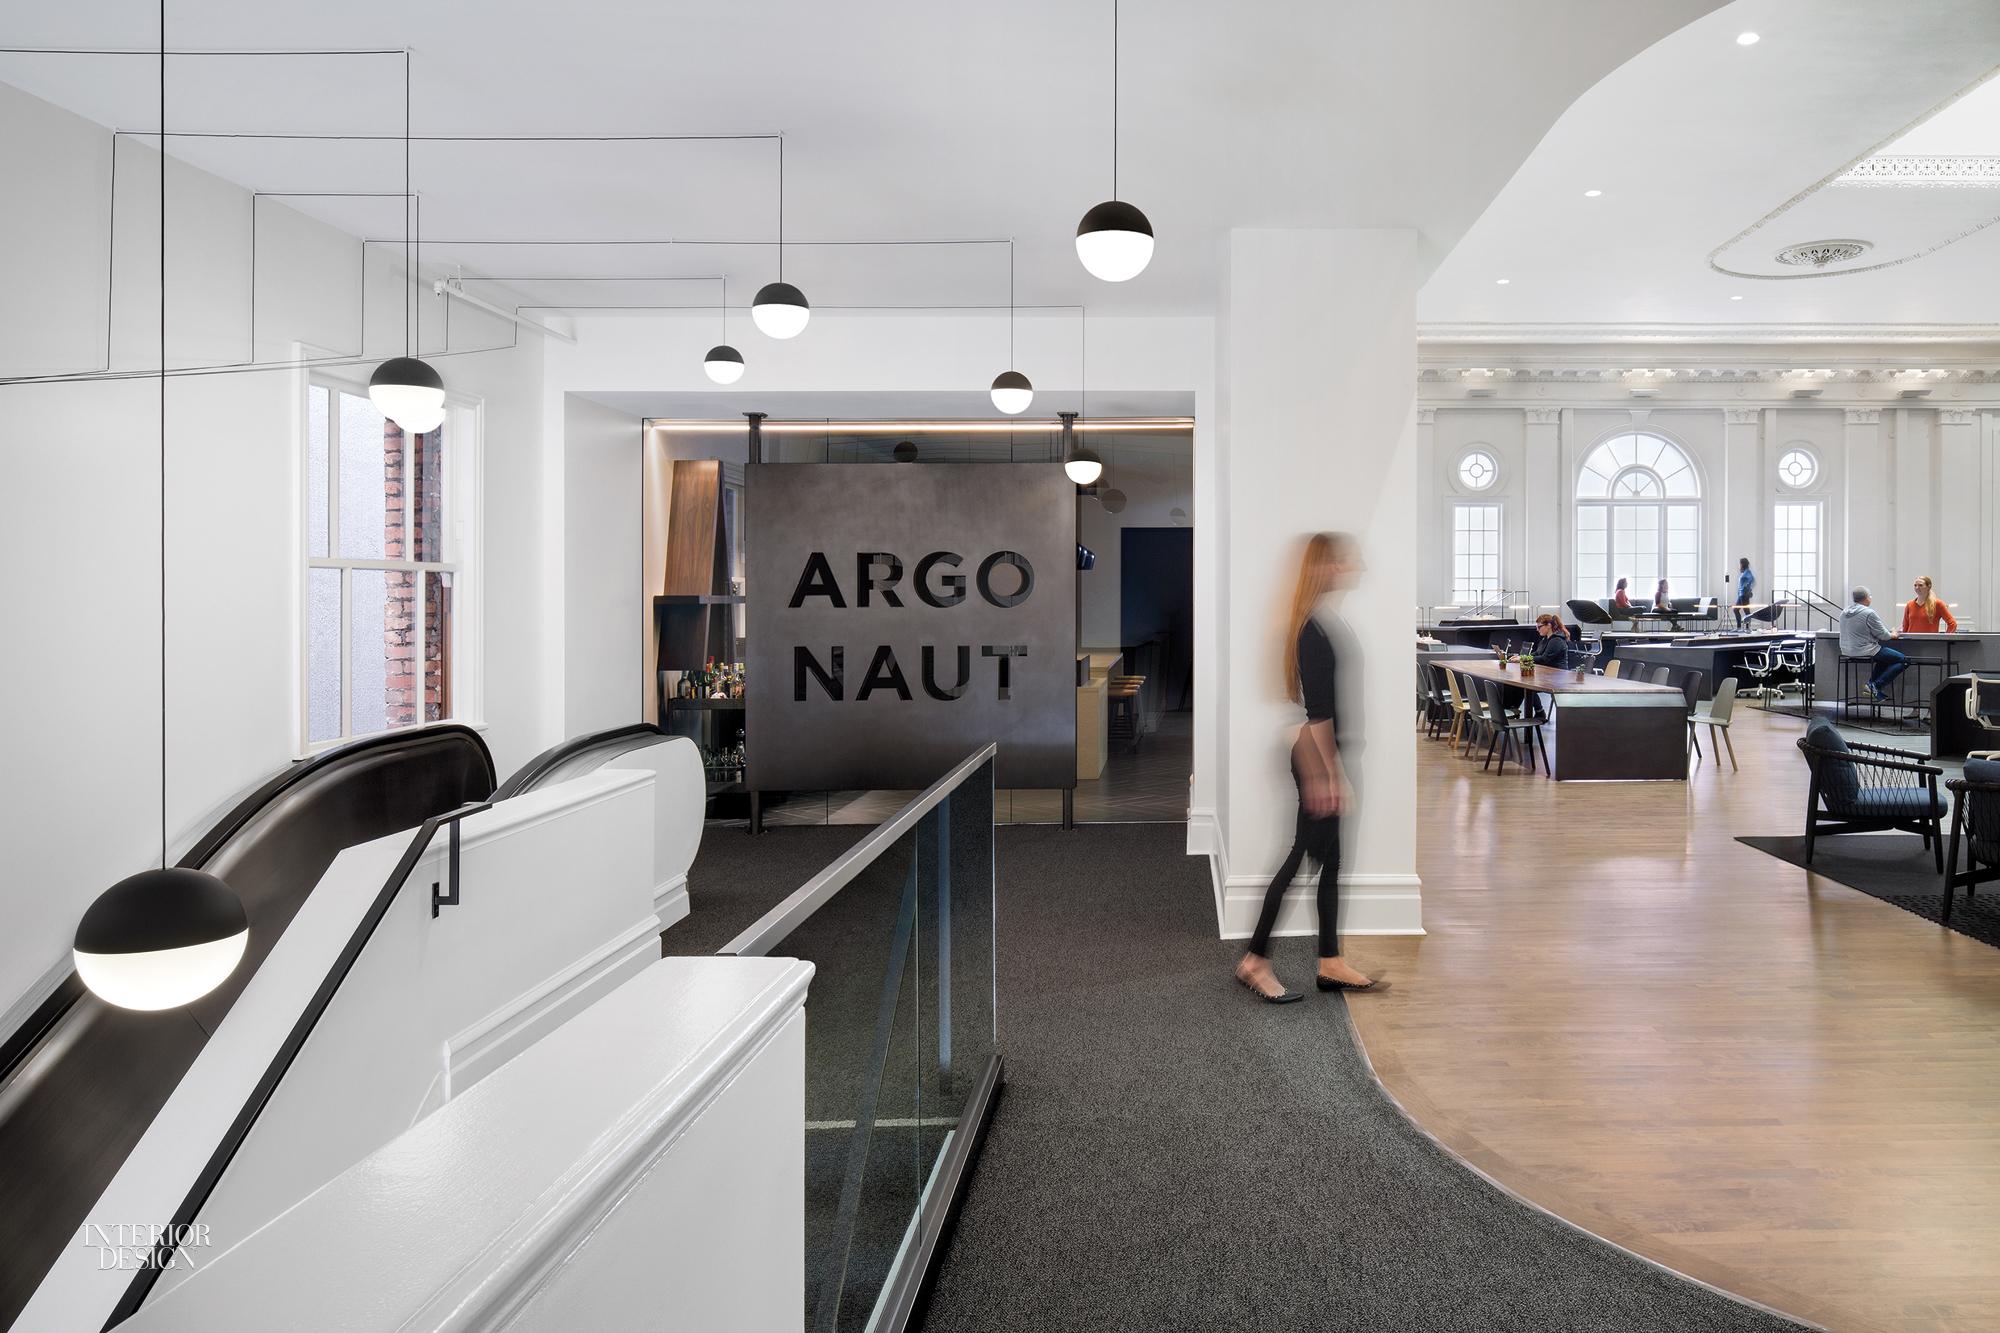 argonaut by huntsman architectural group 2016 best of. Black Bedroom Furniture Sets. Home Design Ideas